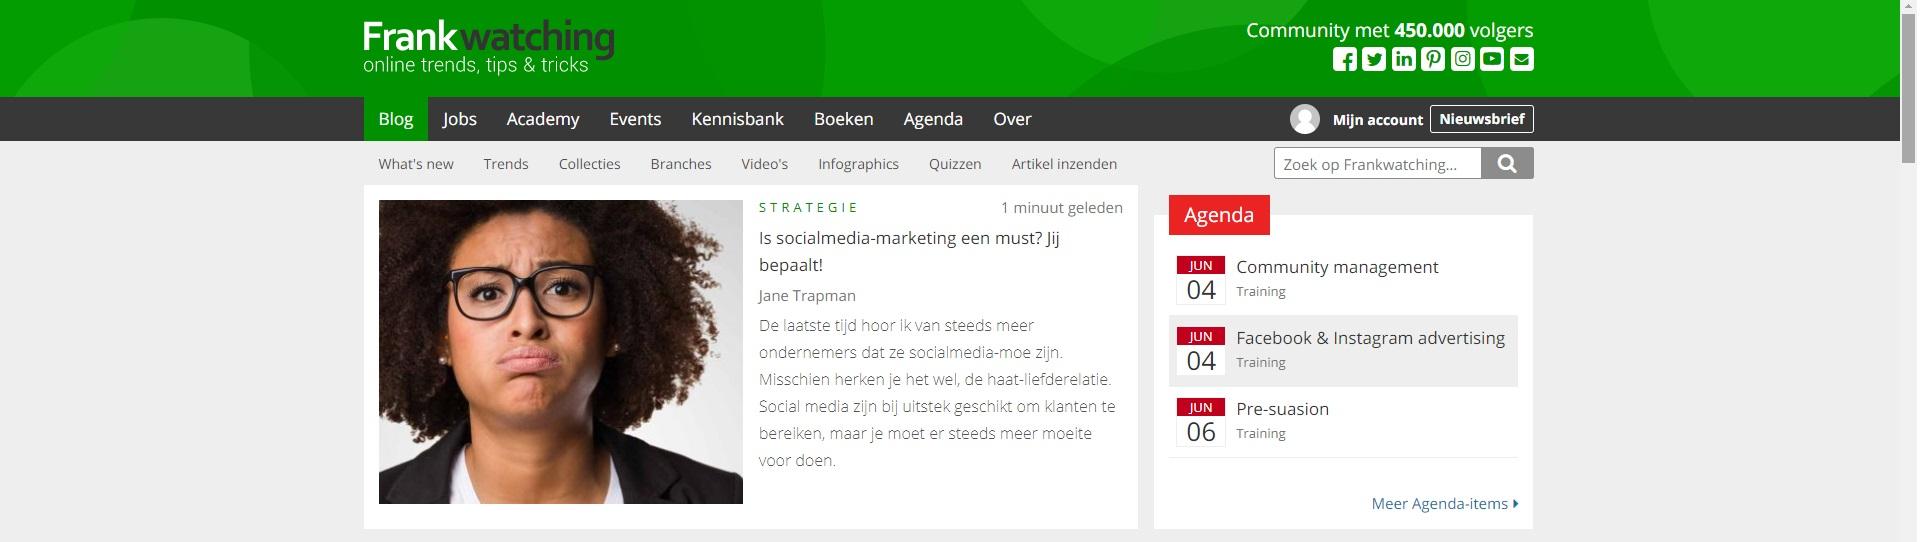 Beste marketingblogs - Frankwatching